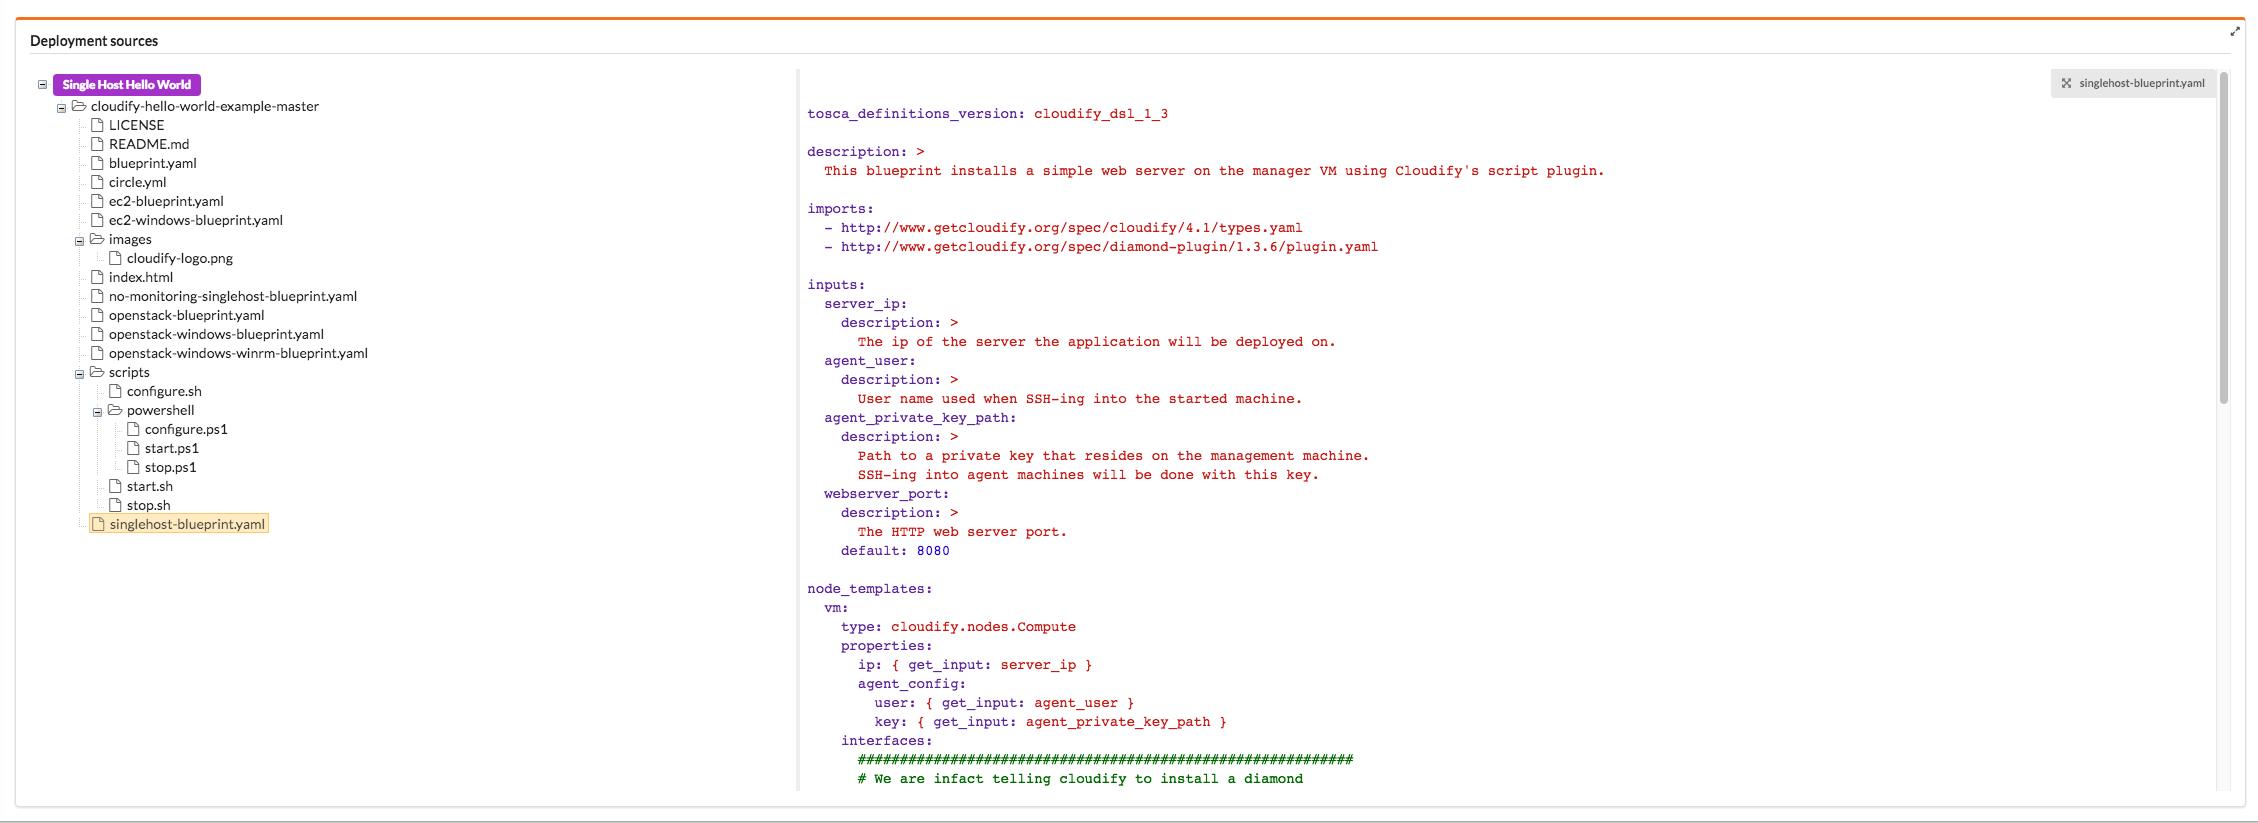 Blueprint sources cloudify documentation center blueprint sources malvernweather Choice Image